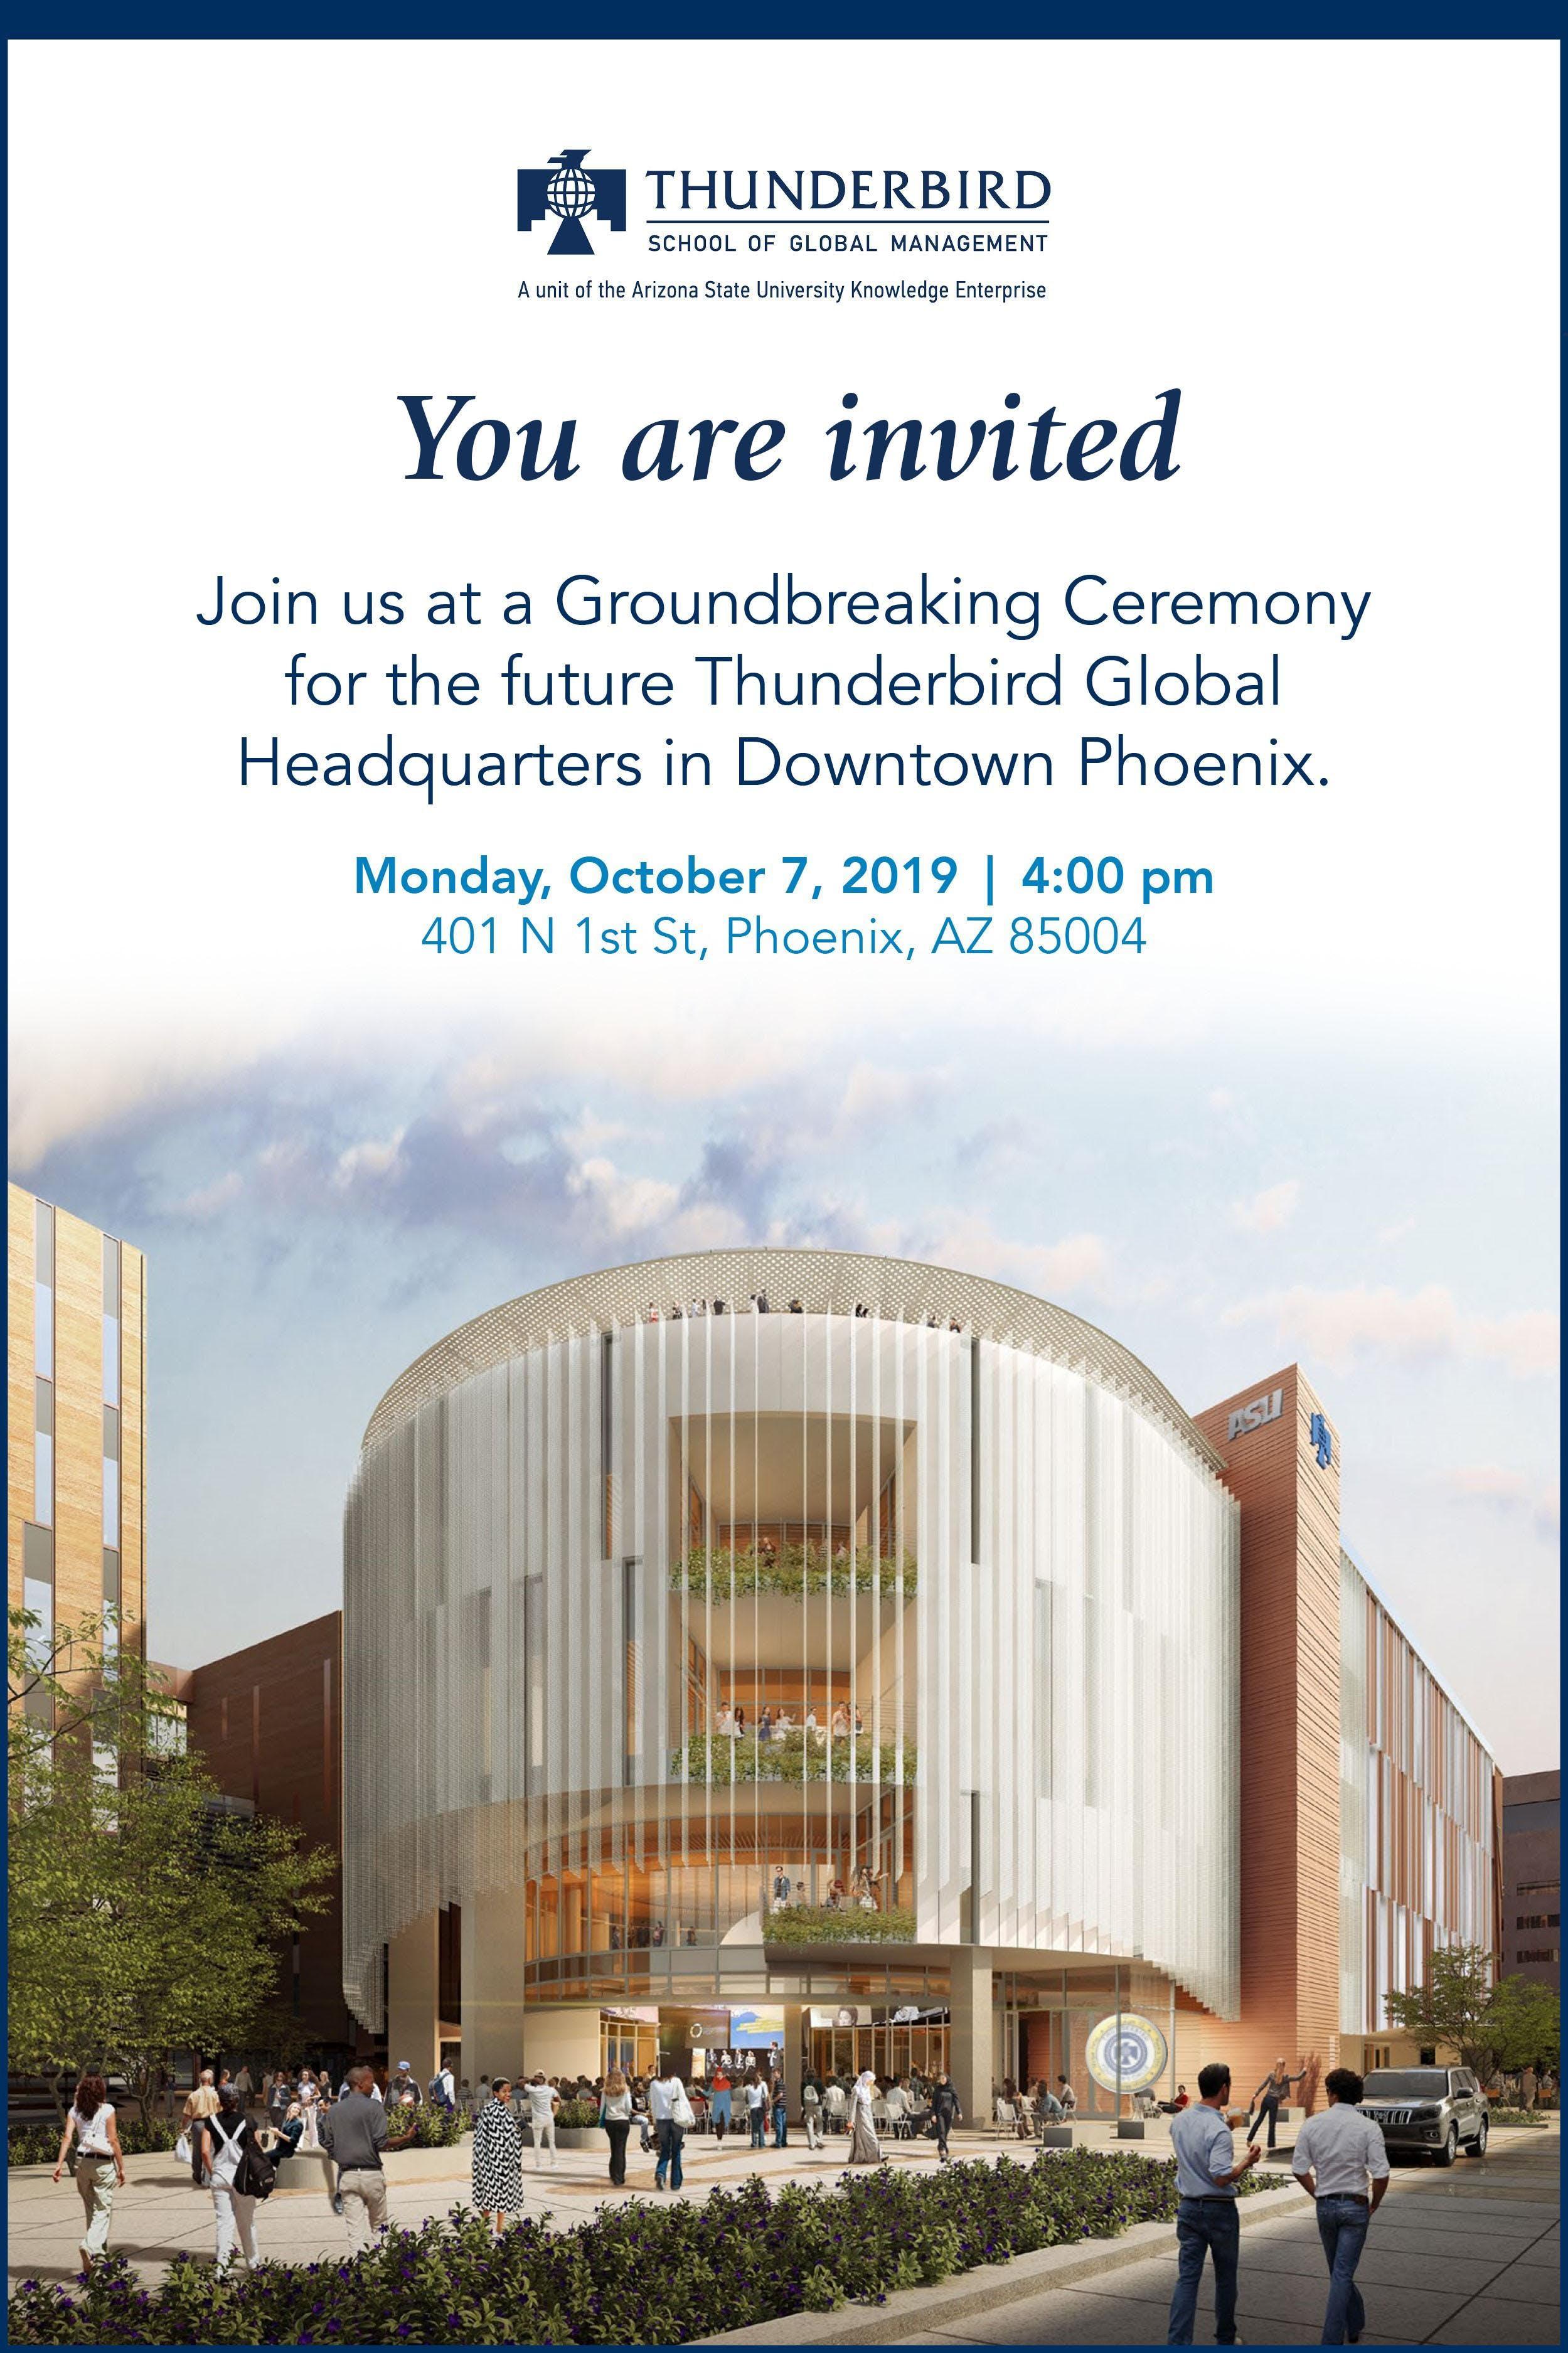 Groundbreaking for the Thunderbird's New Global Headquarters